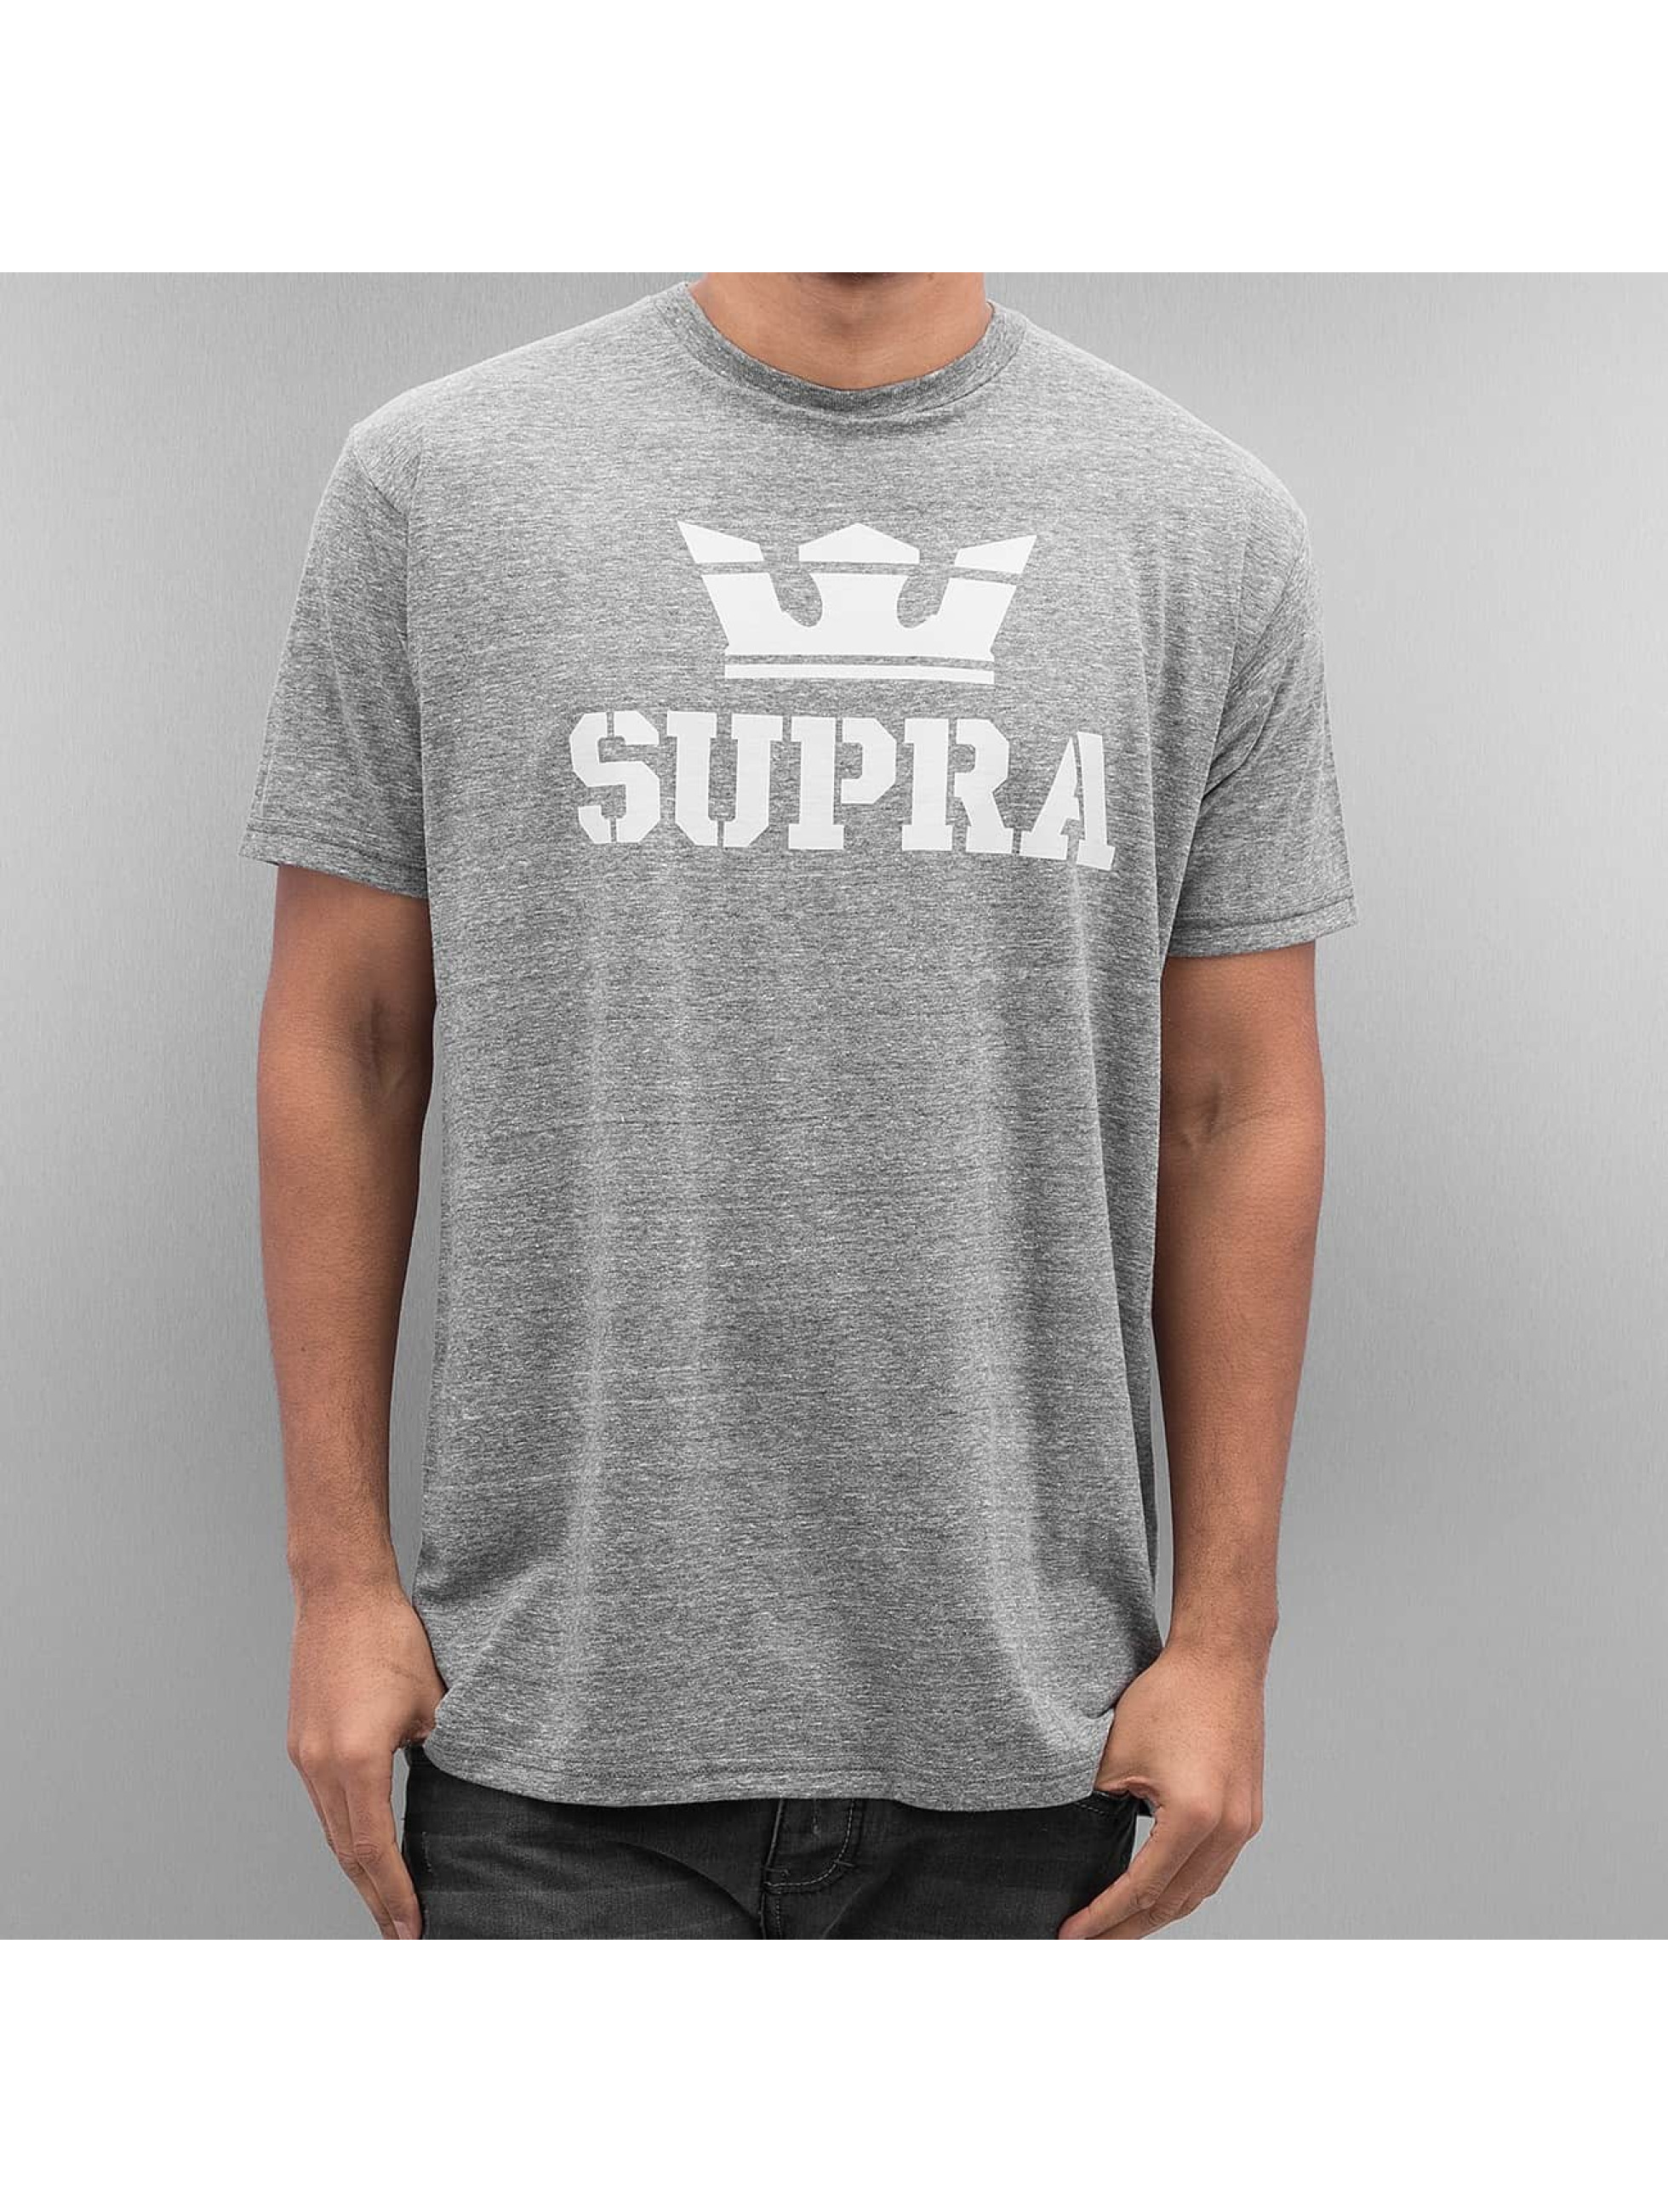 Supra Above T Shirt Grey Heather